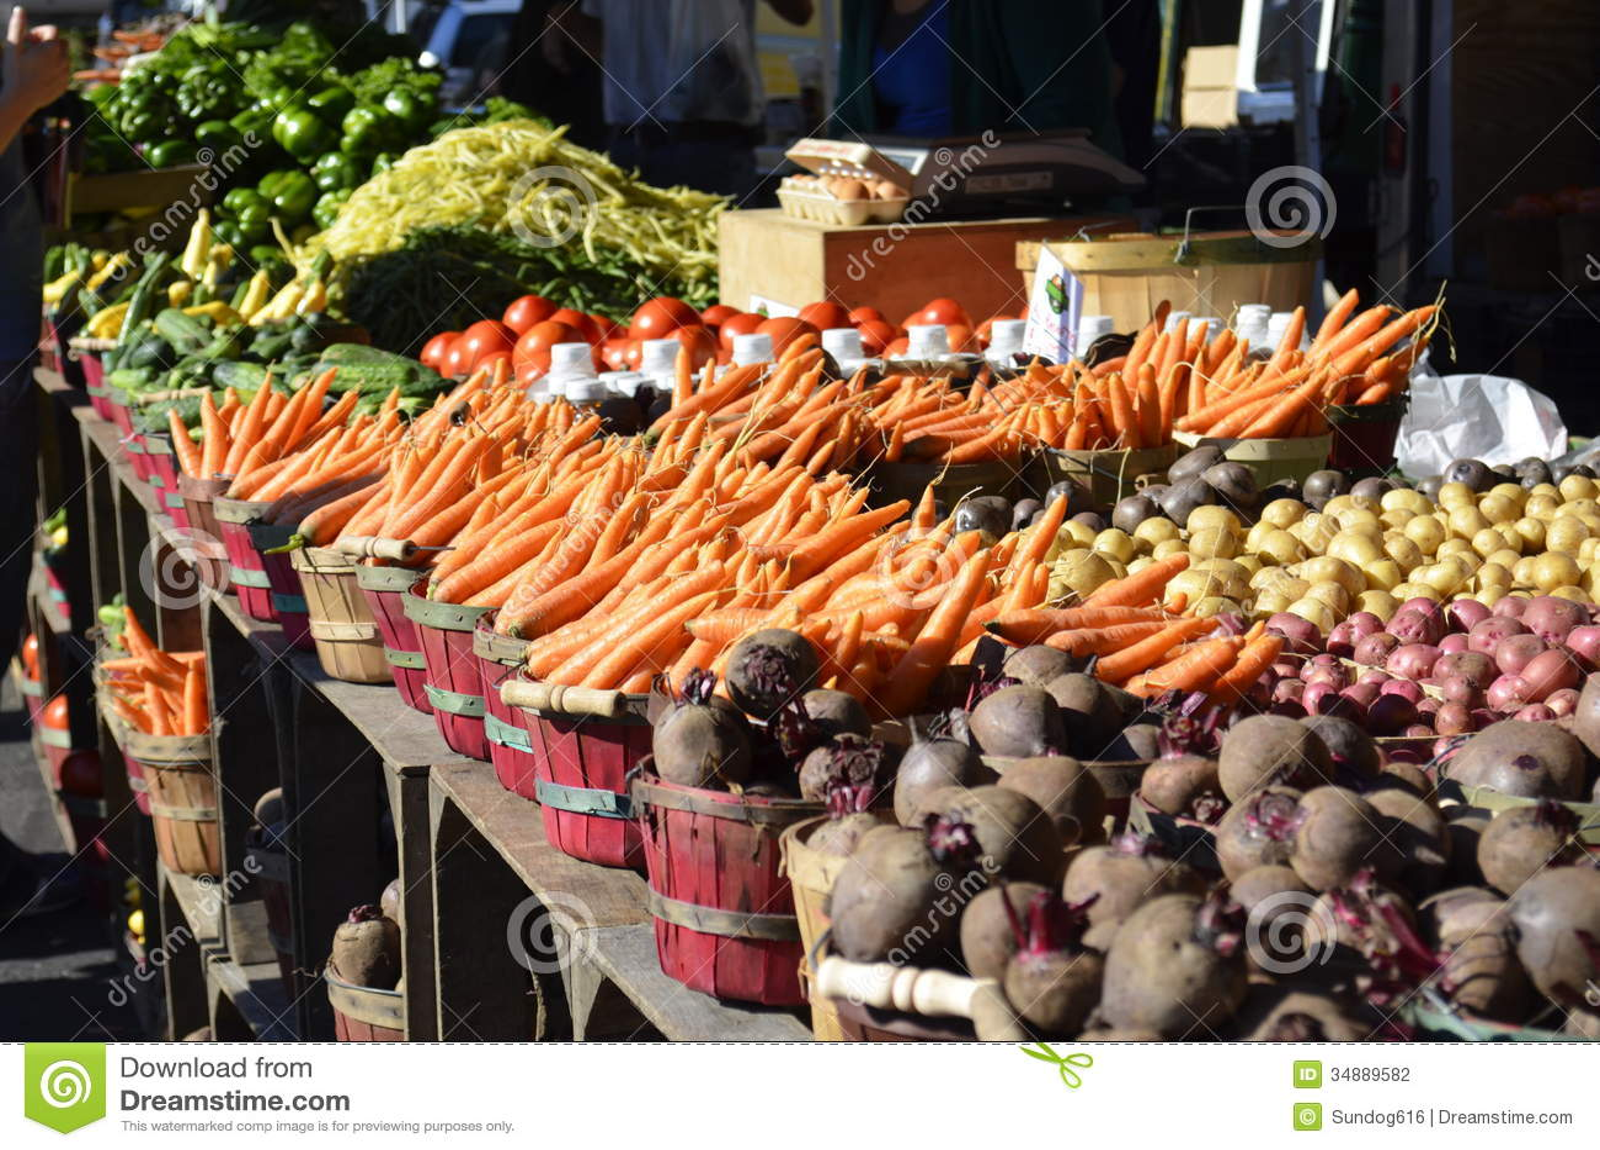 Best Food Markets On England